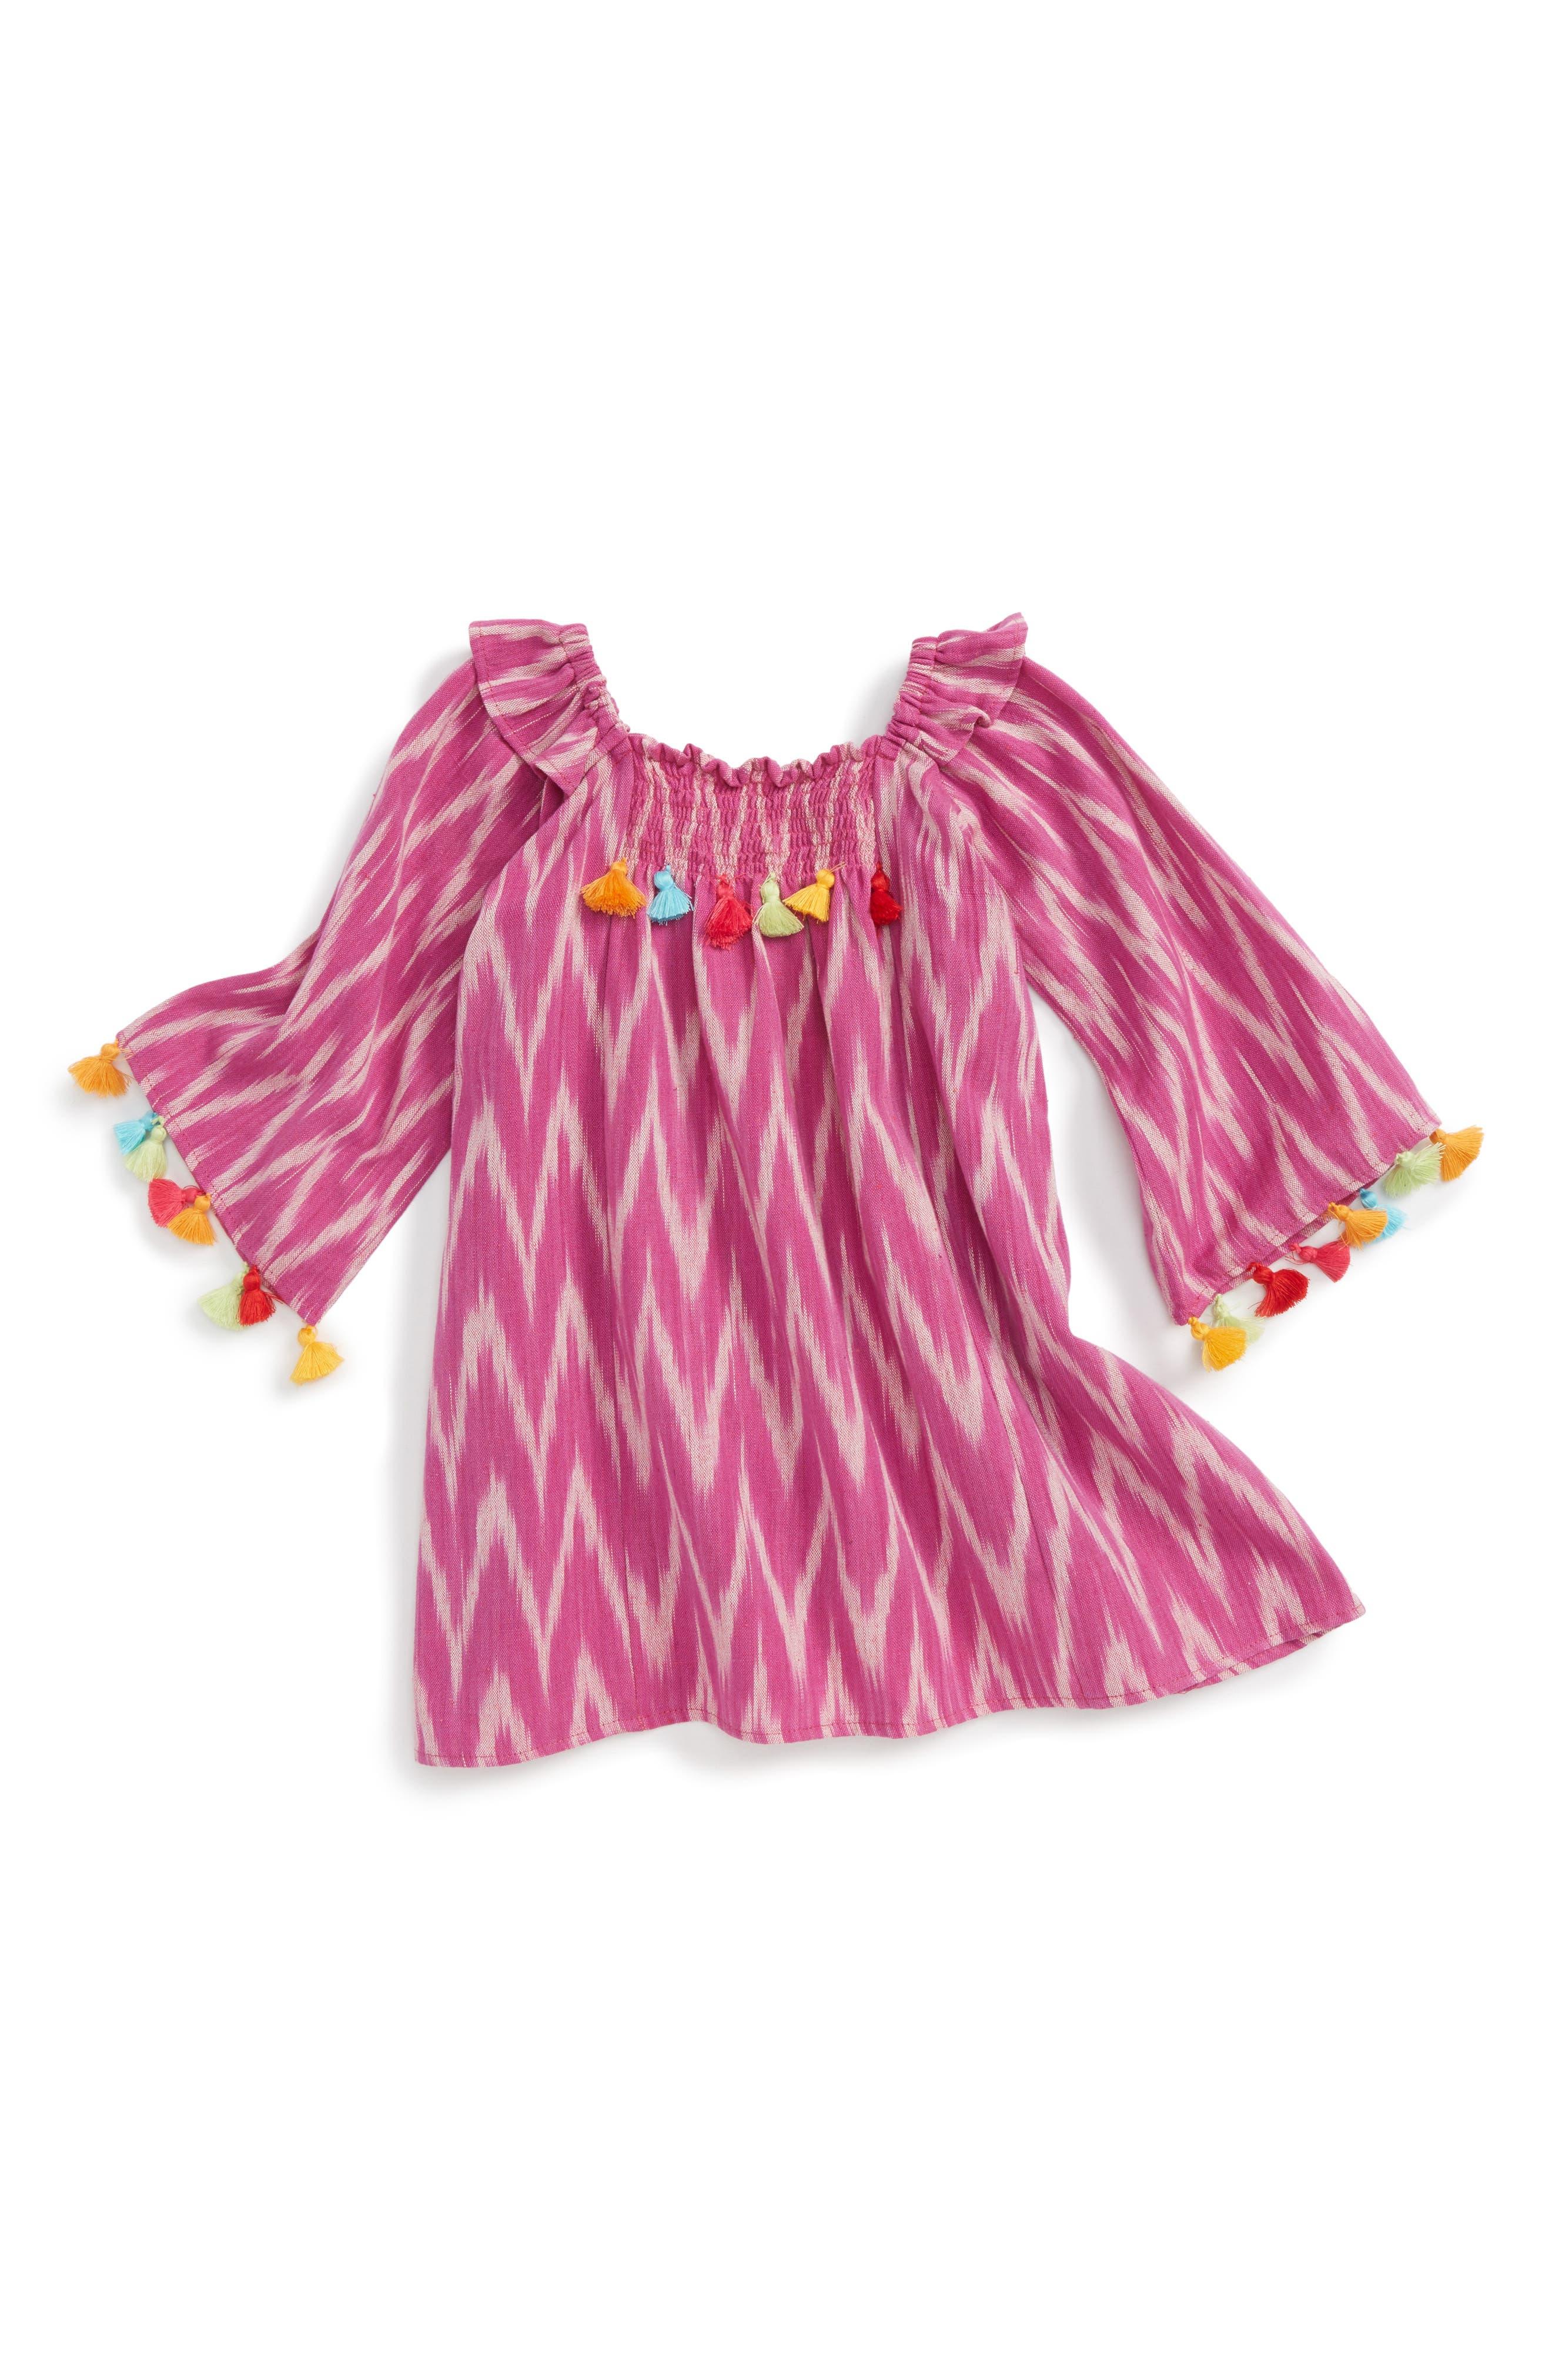 Main Image - Masalababy Ekta Tassel Trim Dress (Baby Girls)